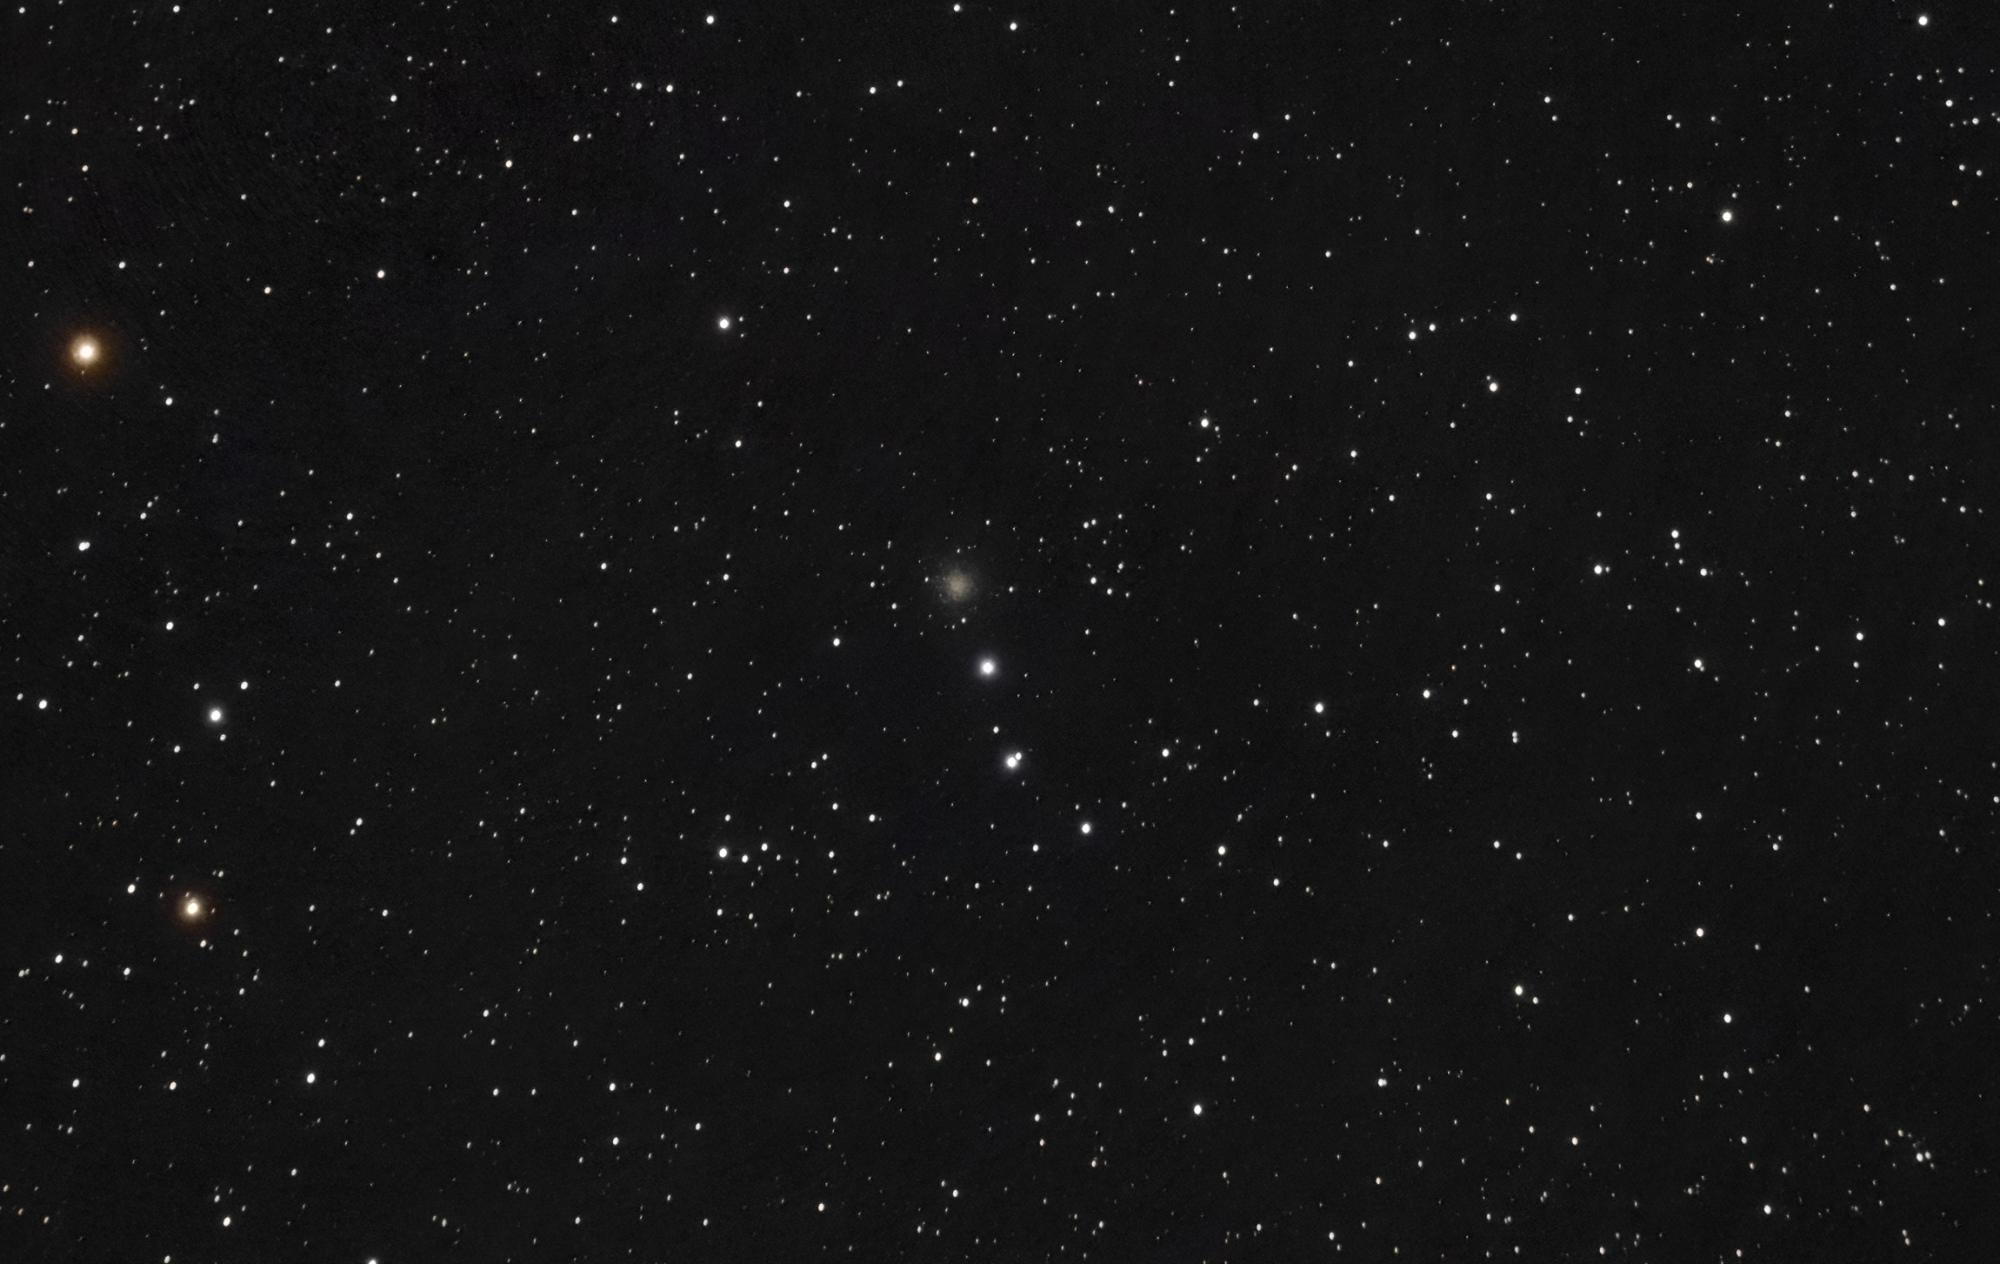 NGC2419-denoise-denoise-crop.jpg